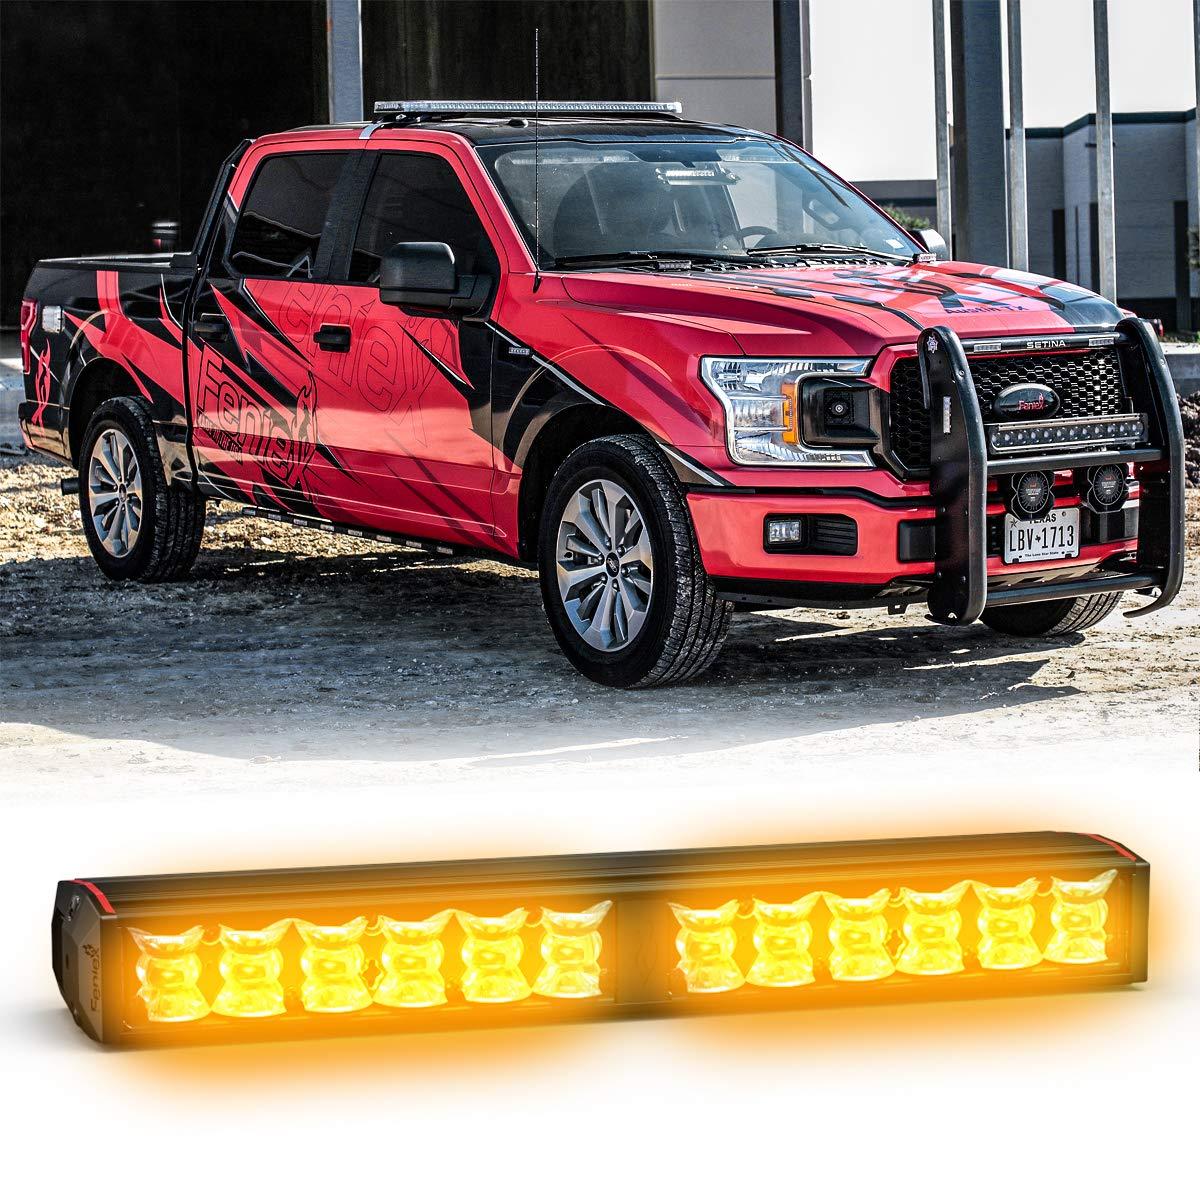 Feniex Fusion 200 Stick Light Single Color Red, 180/°